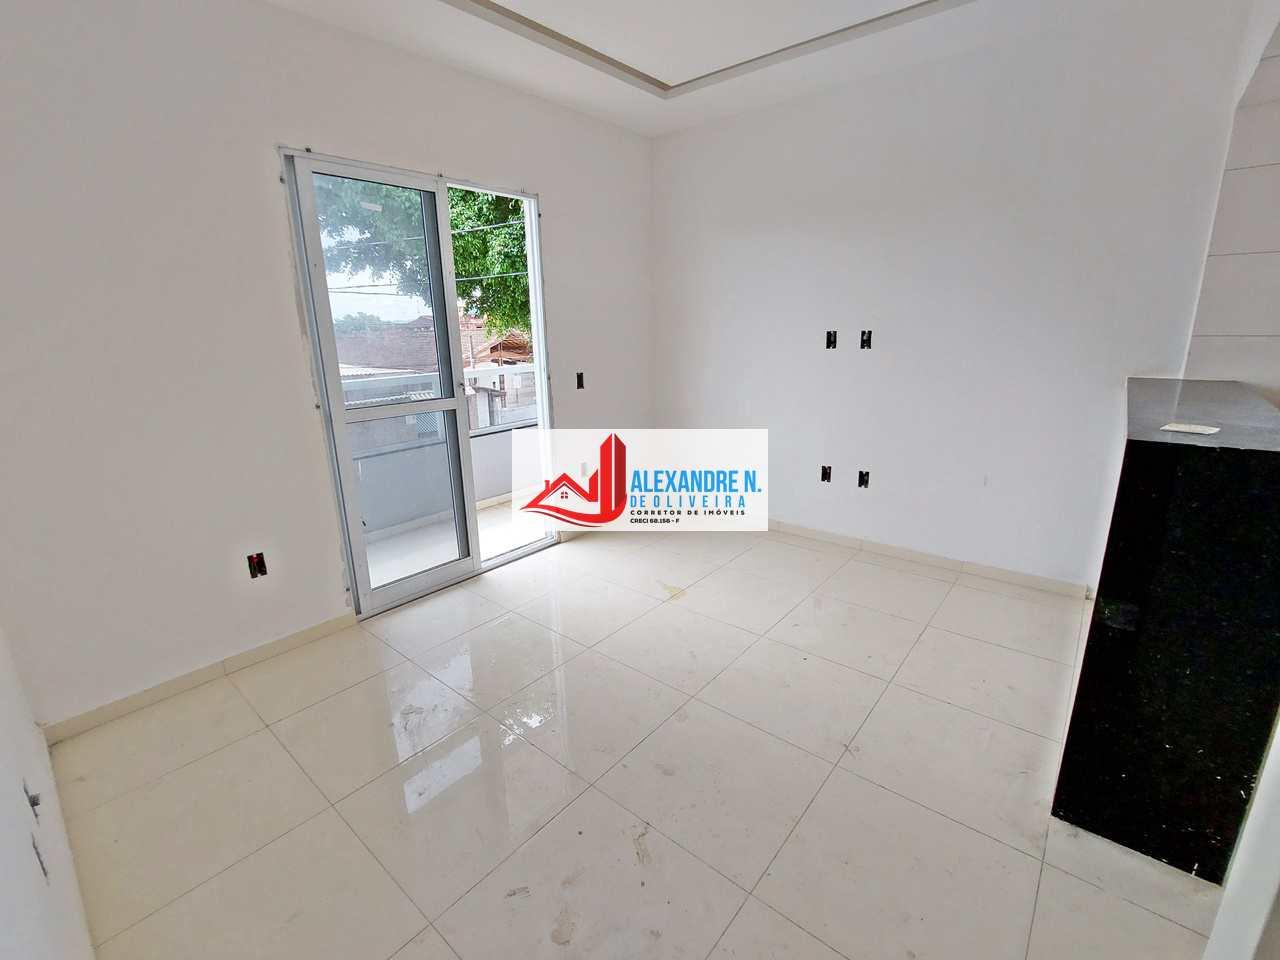 Sobrado novo, 2 dorms, Tupi, Praia Grande, R$ 245 mil, SB00026